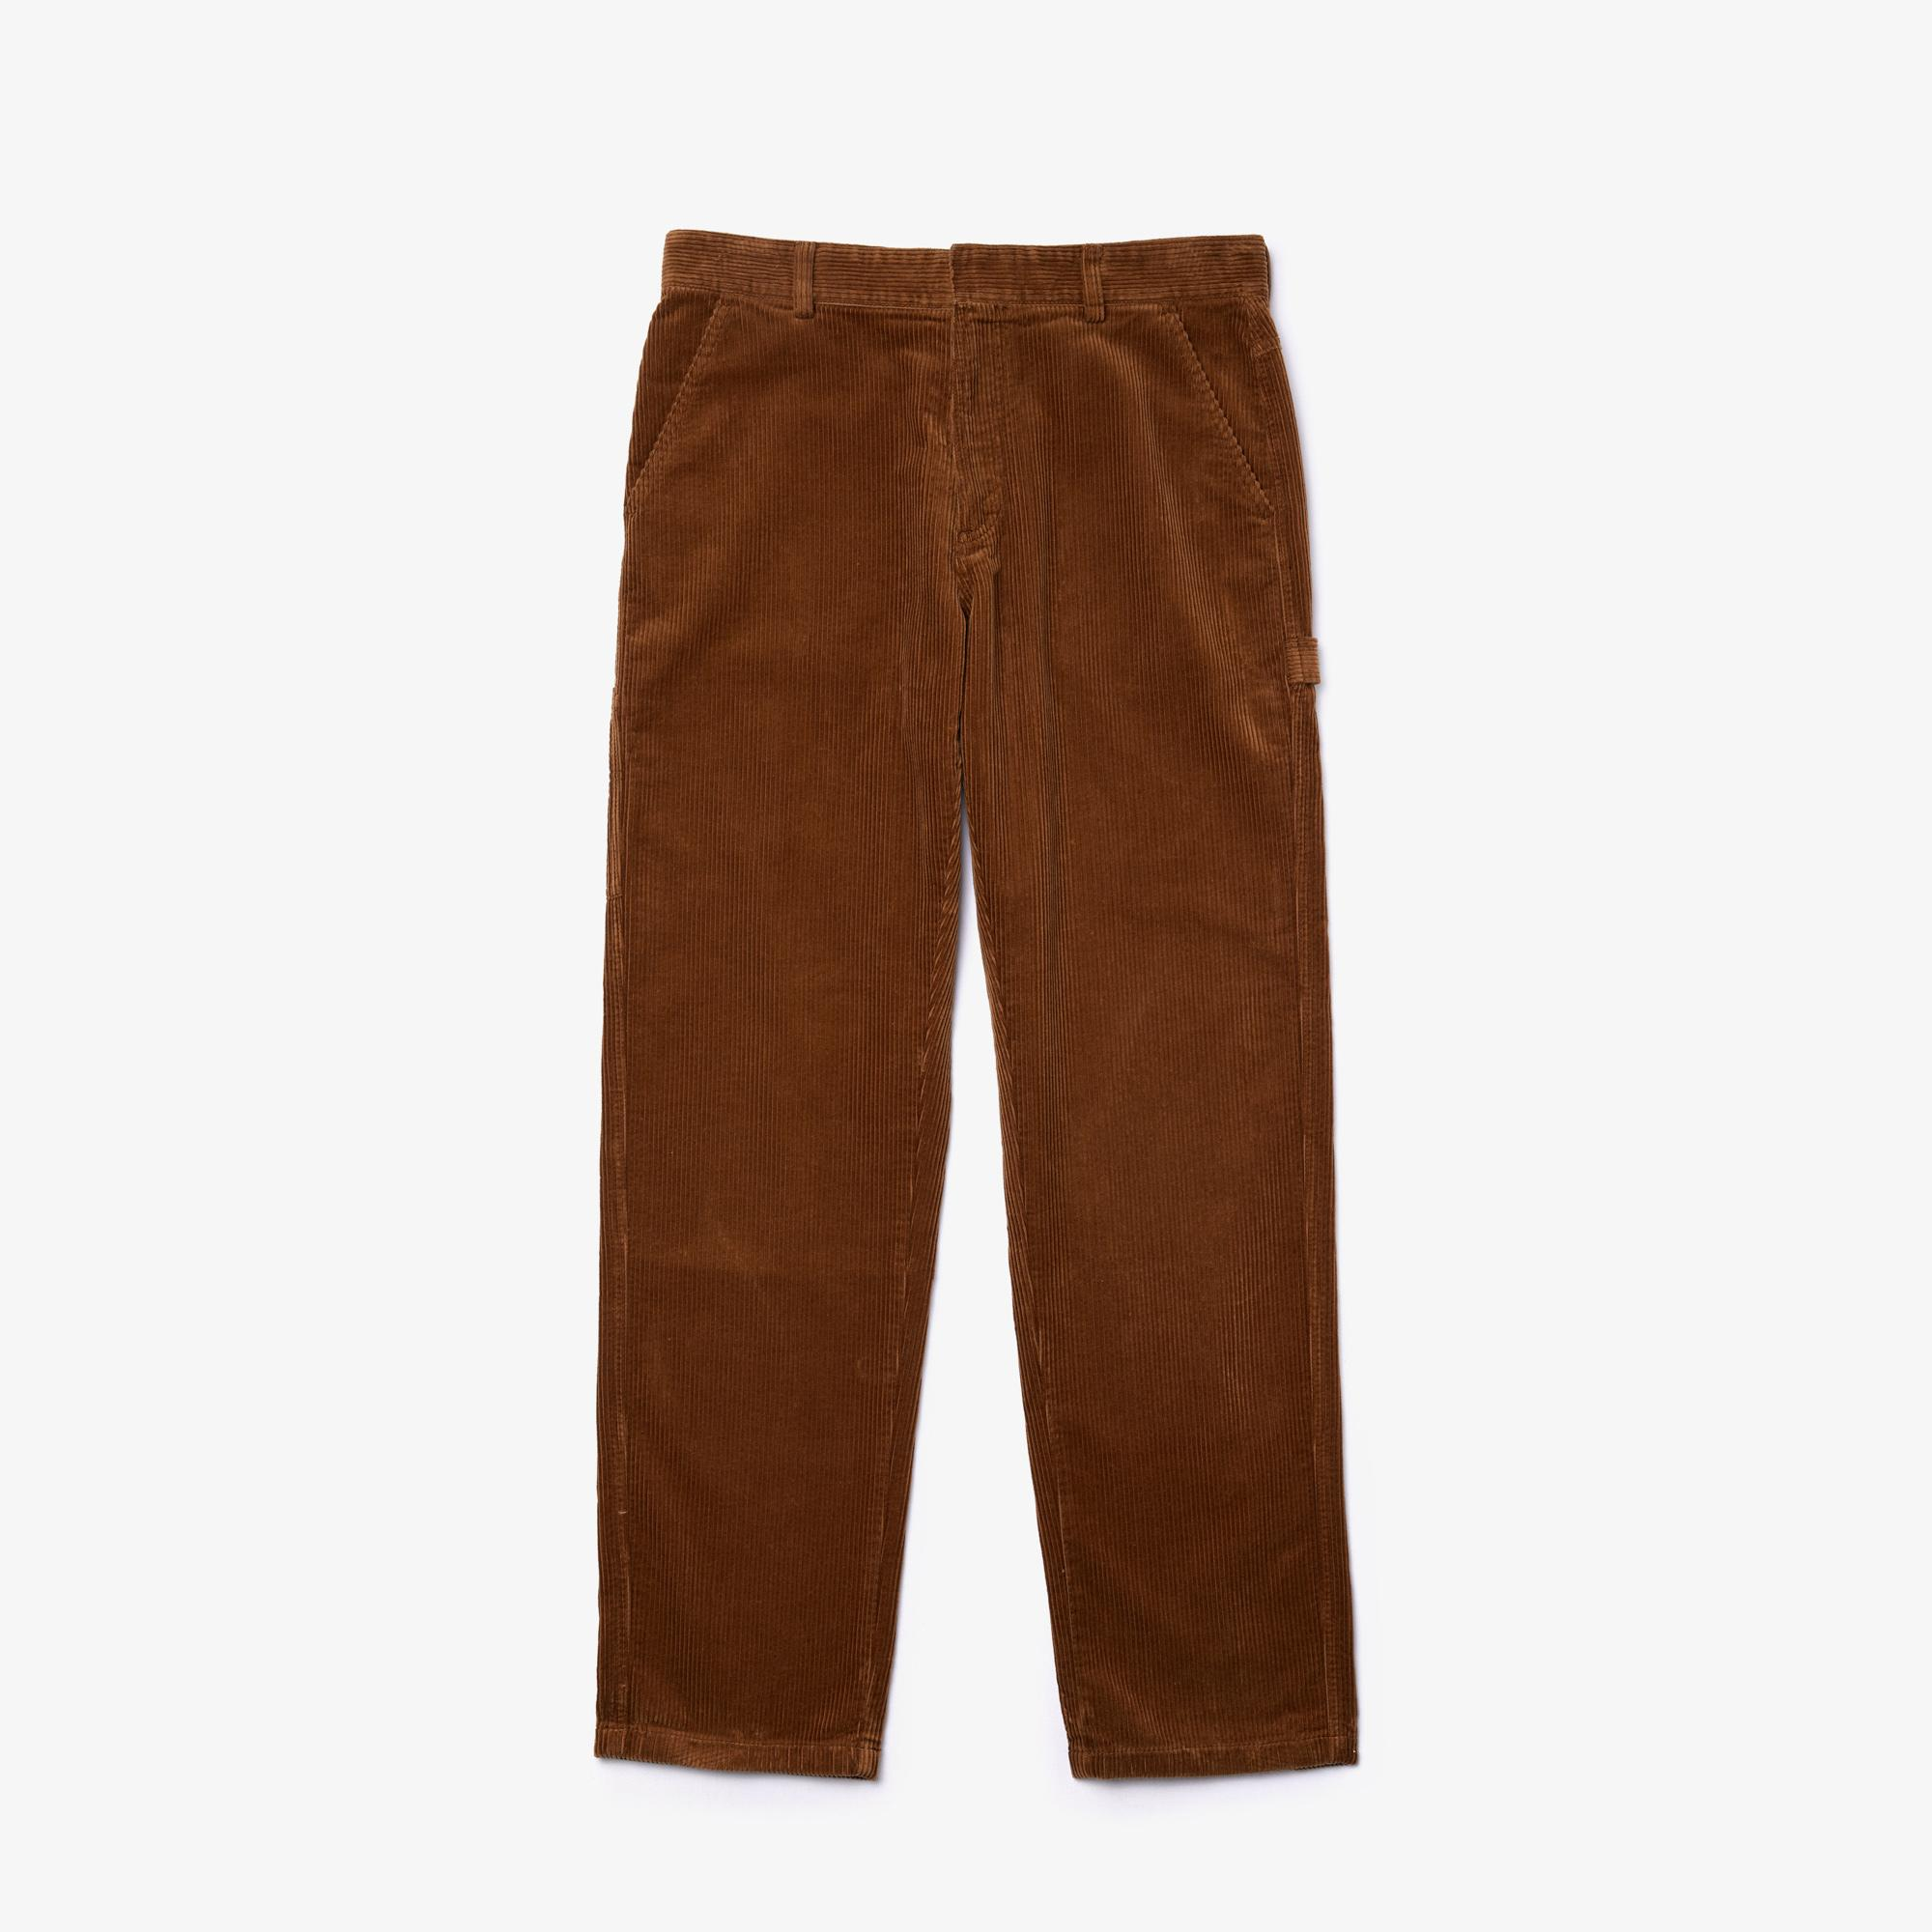 Lacoste L!VE Erkek Kadife Kahverengi Pantolon